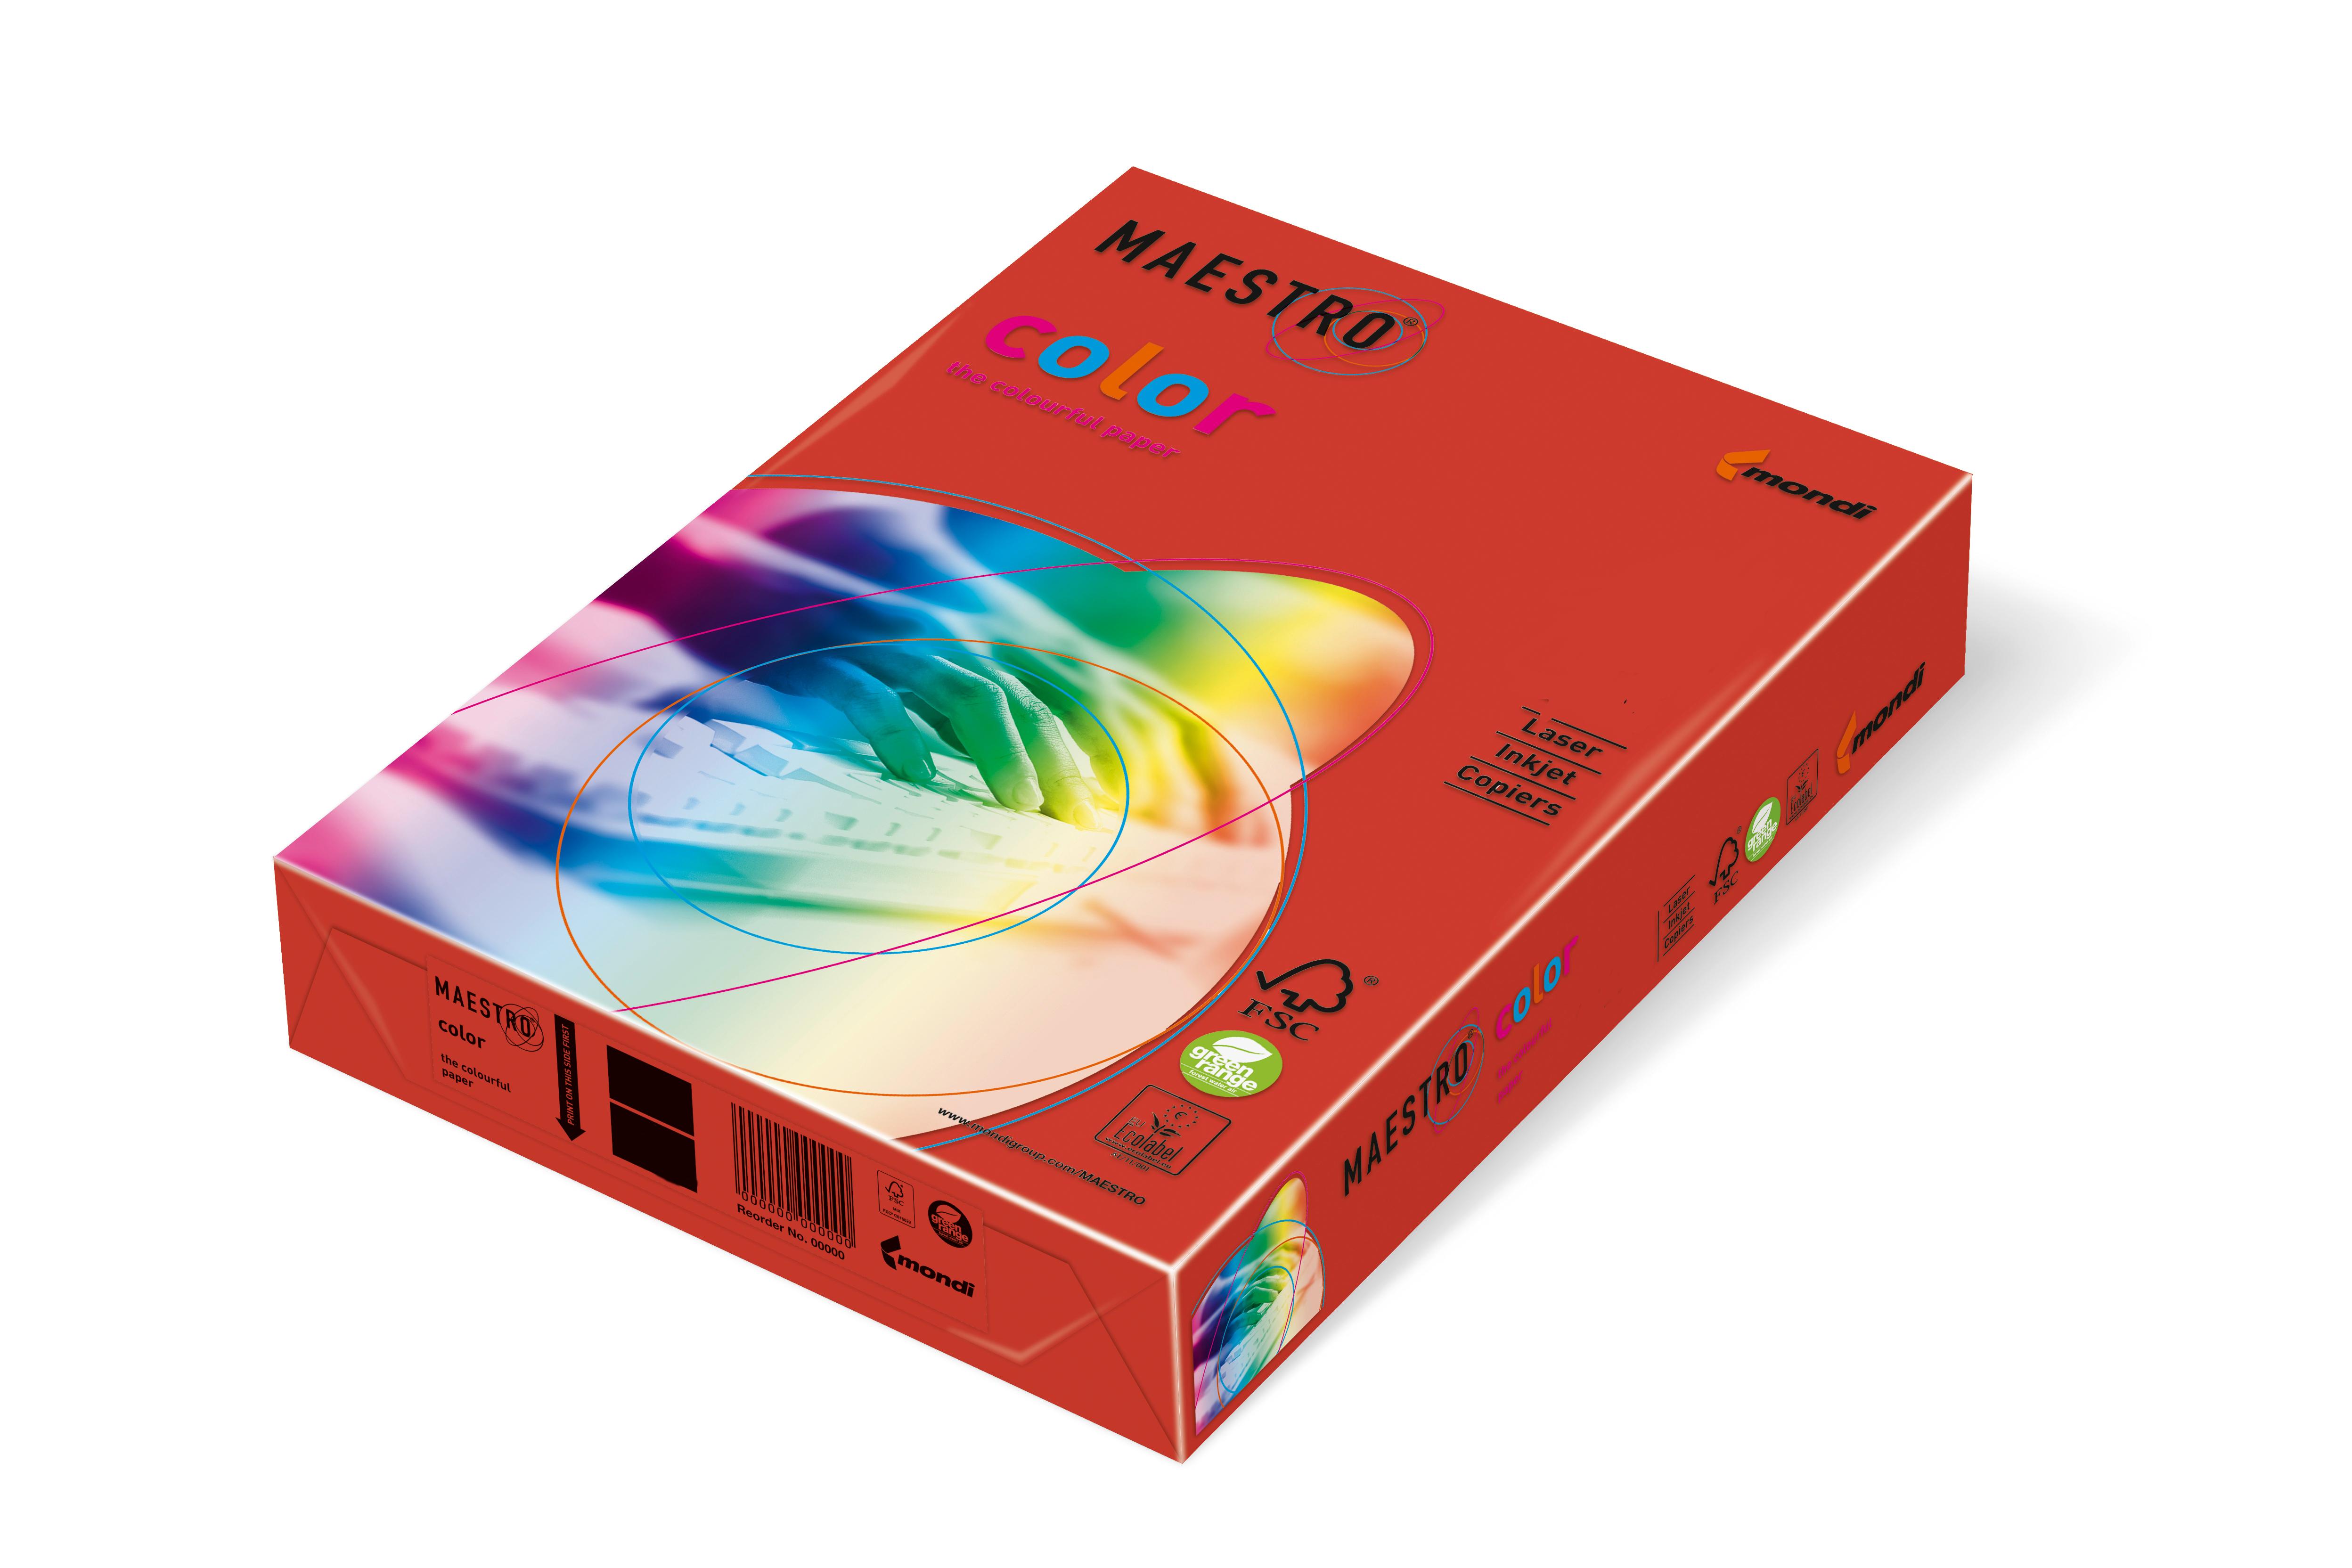 Vorschau: Mondi Maestro Color korallenrot 160g/m² DIN-A4 - 250 Blatt CO44